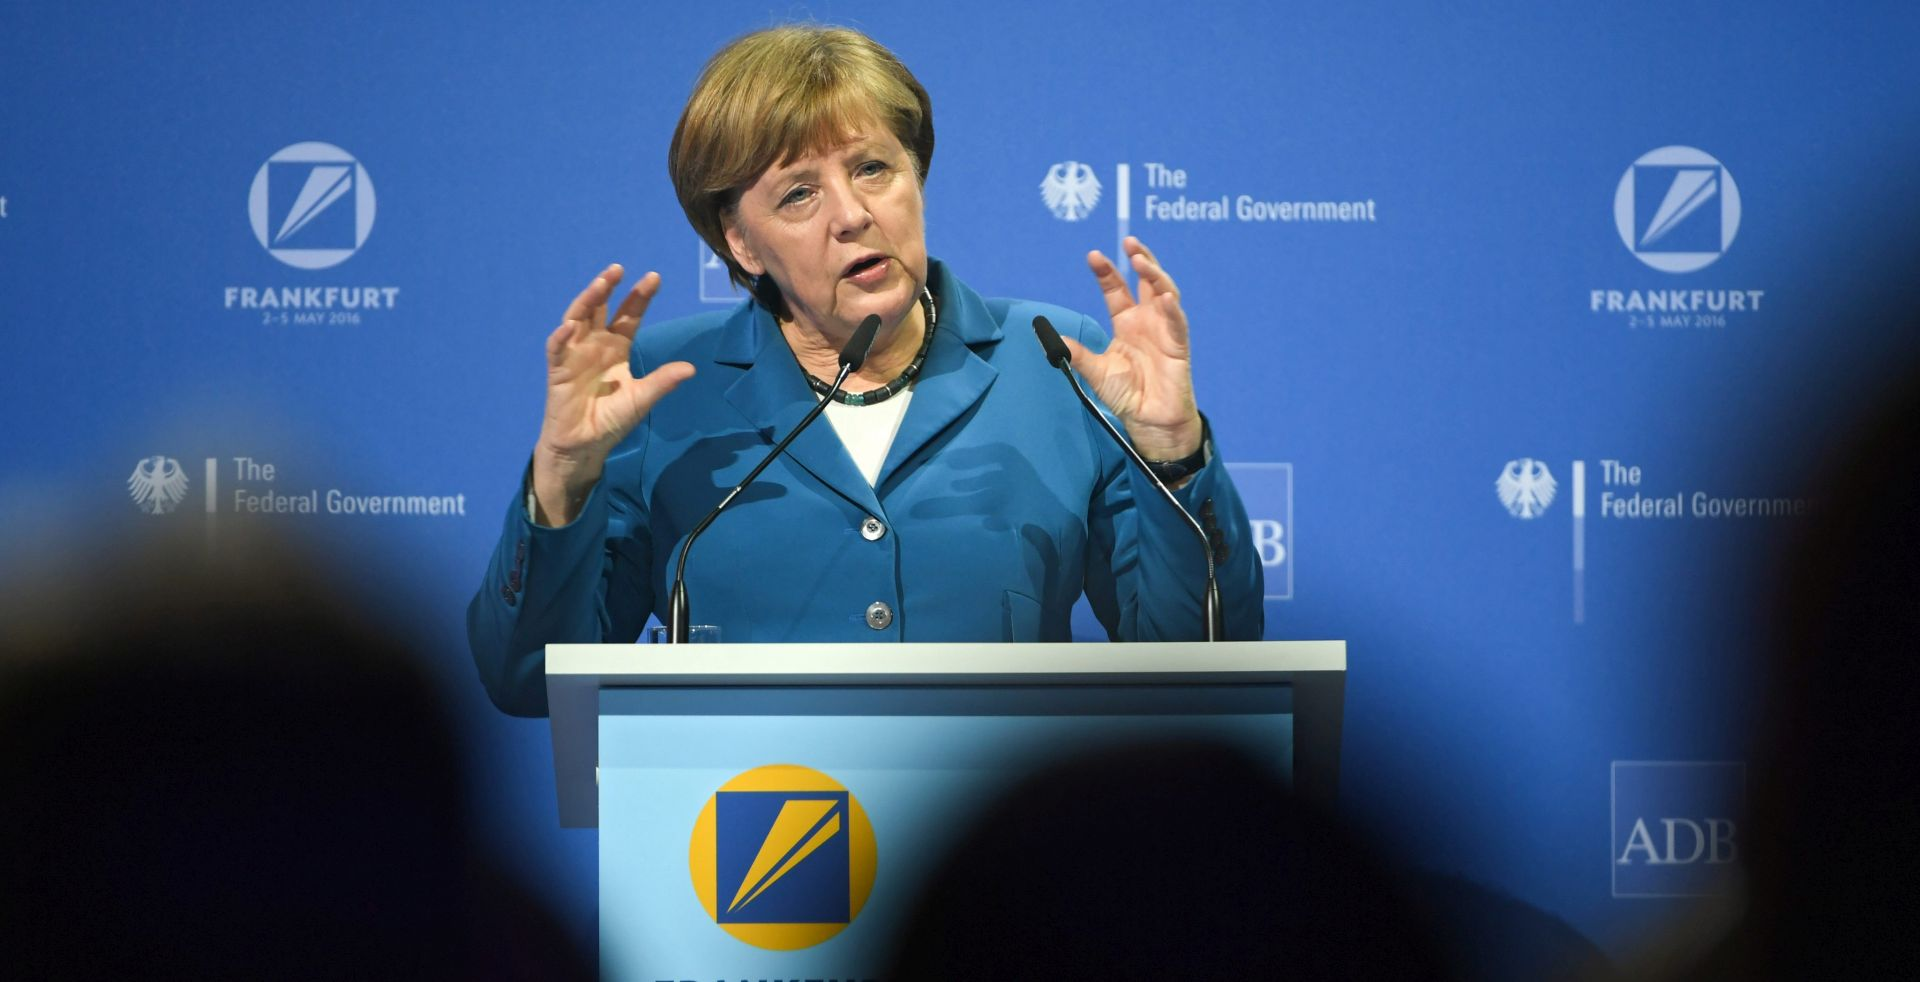 Bild: Merkel razmišlja o komunikaciji s AfD-om